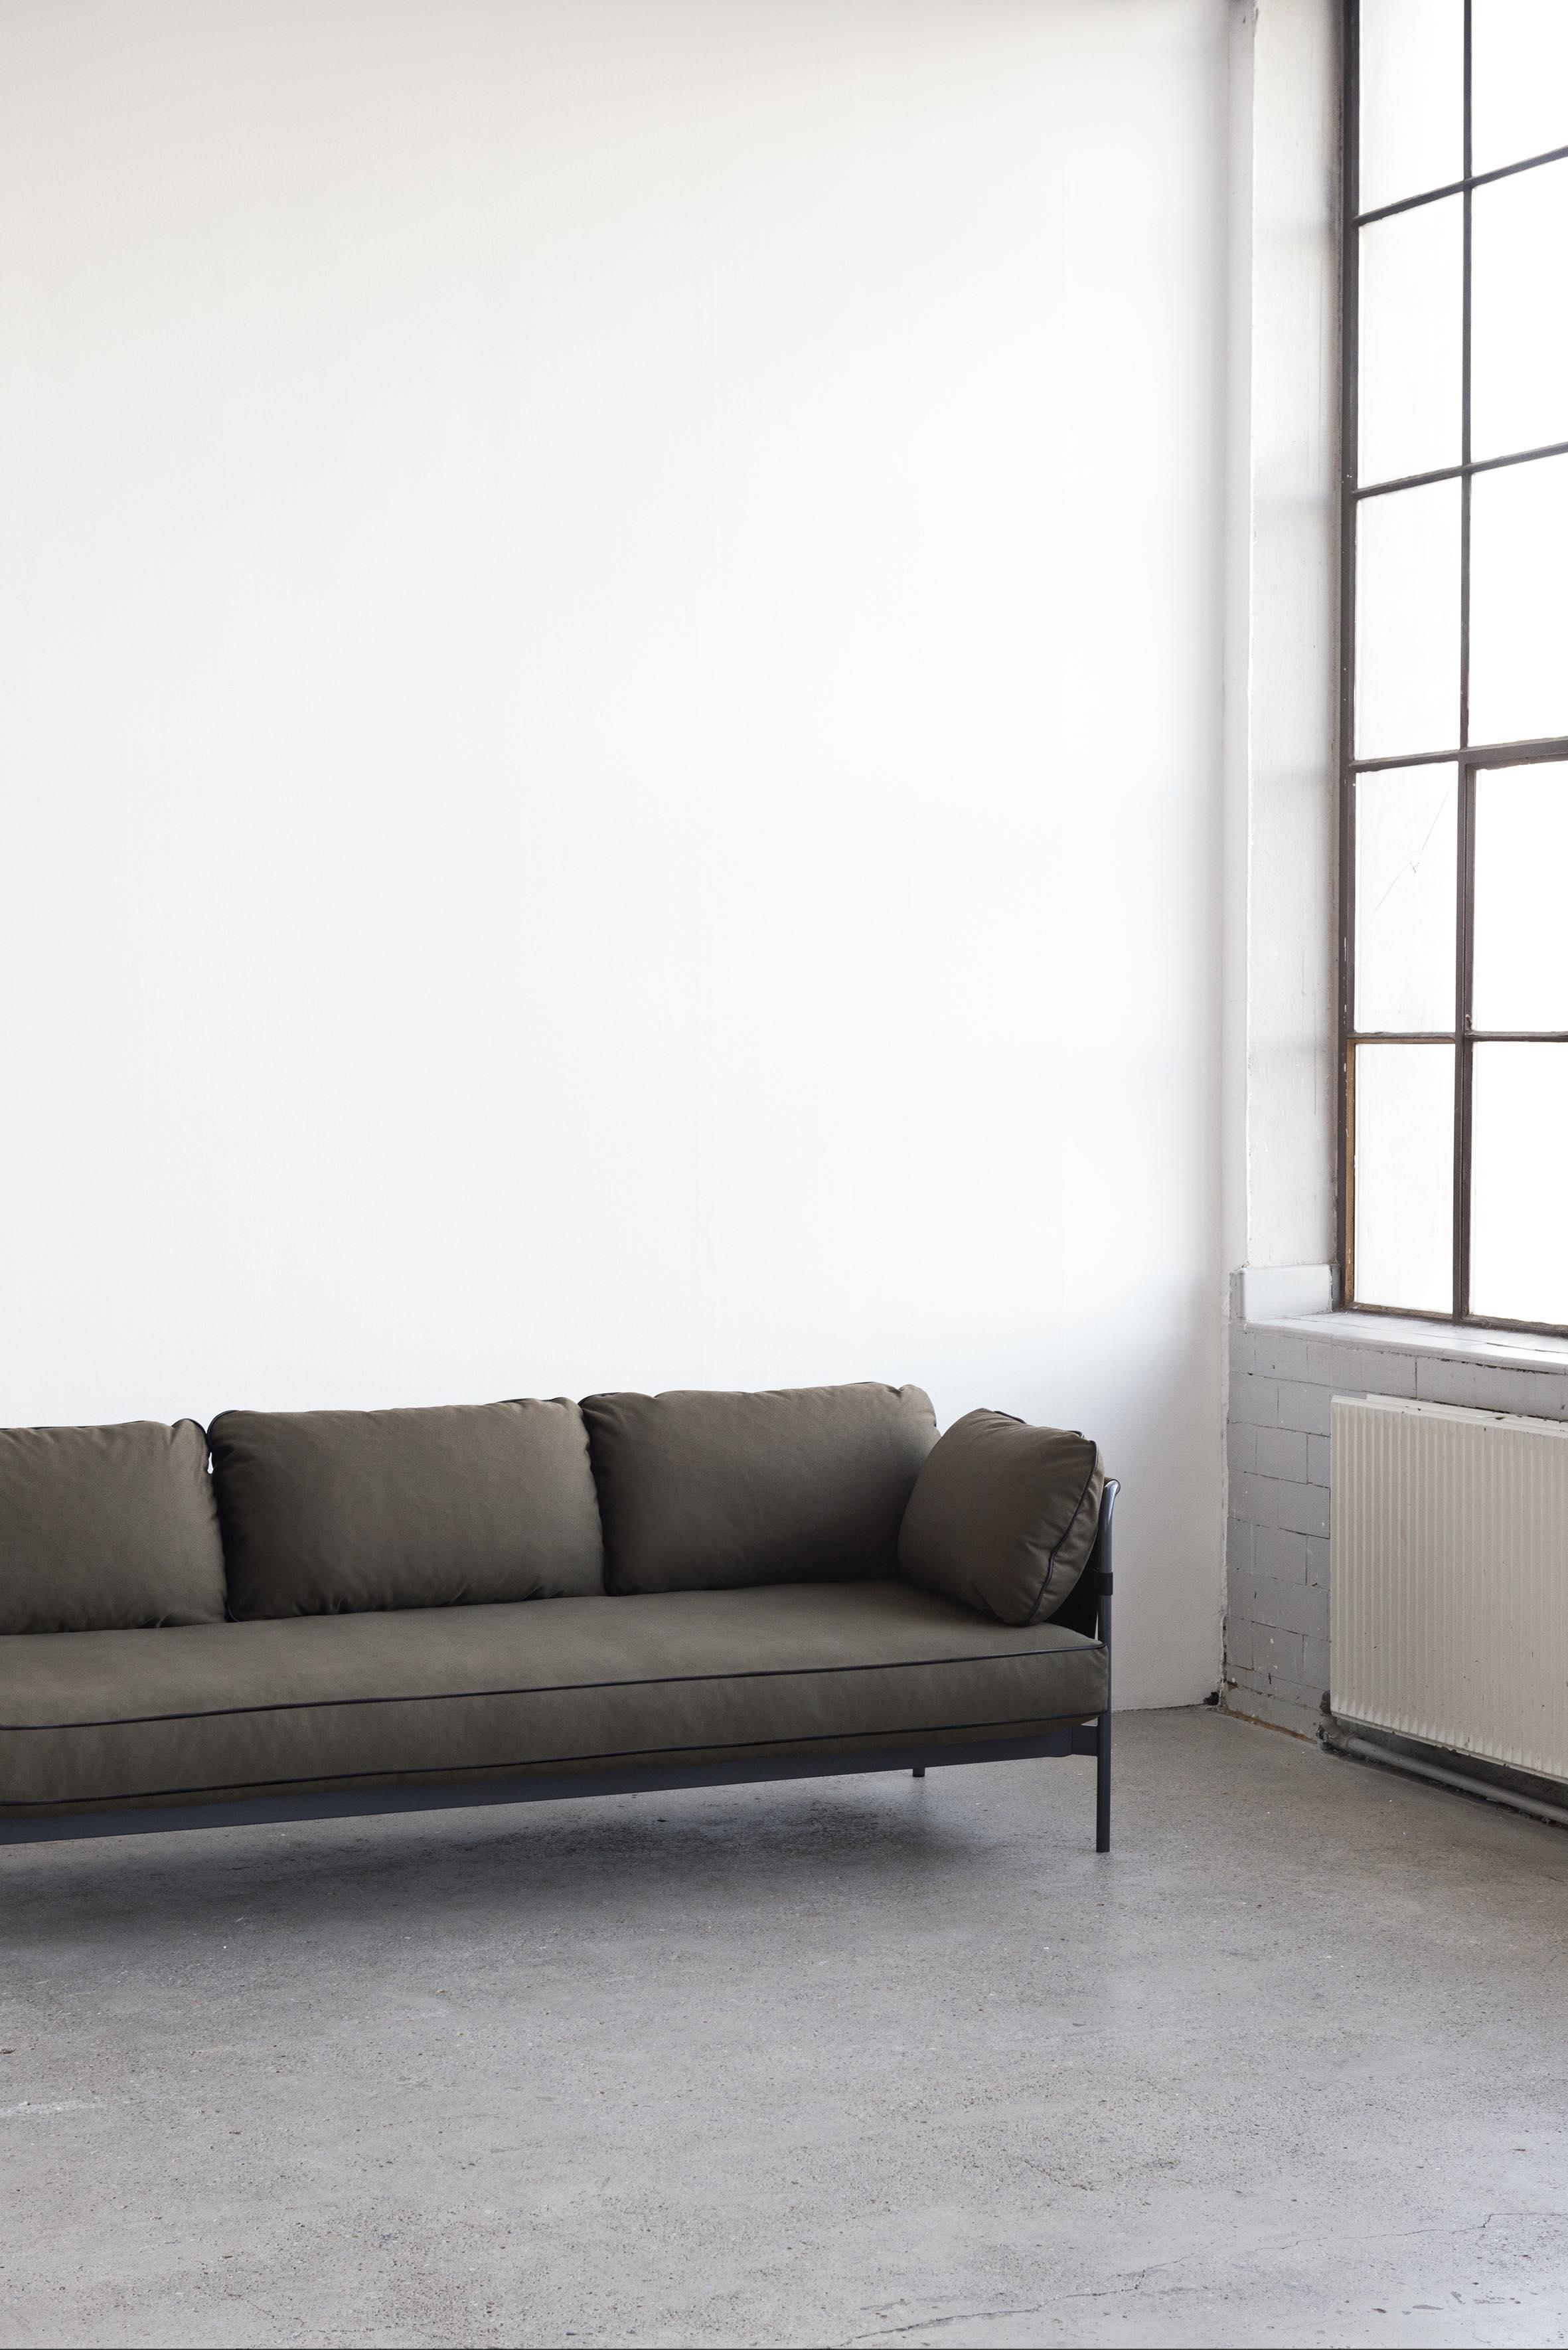 hay revolutioniert sofas mit dem neuen sofa can designblog. Black Bedroom Furniture Sets. Home Design Ideas